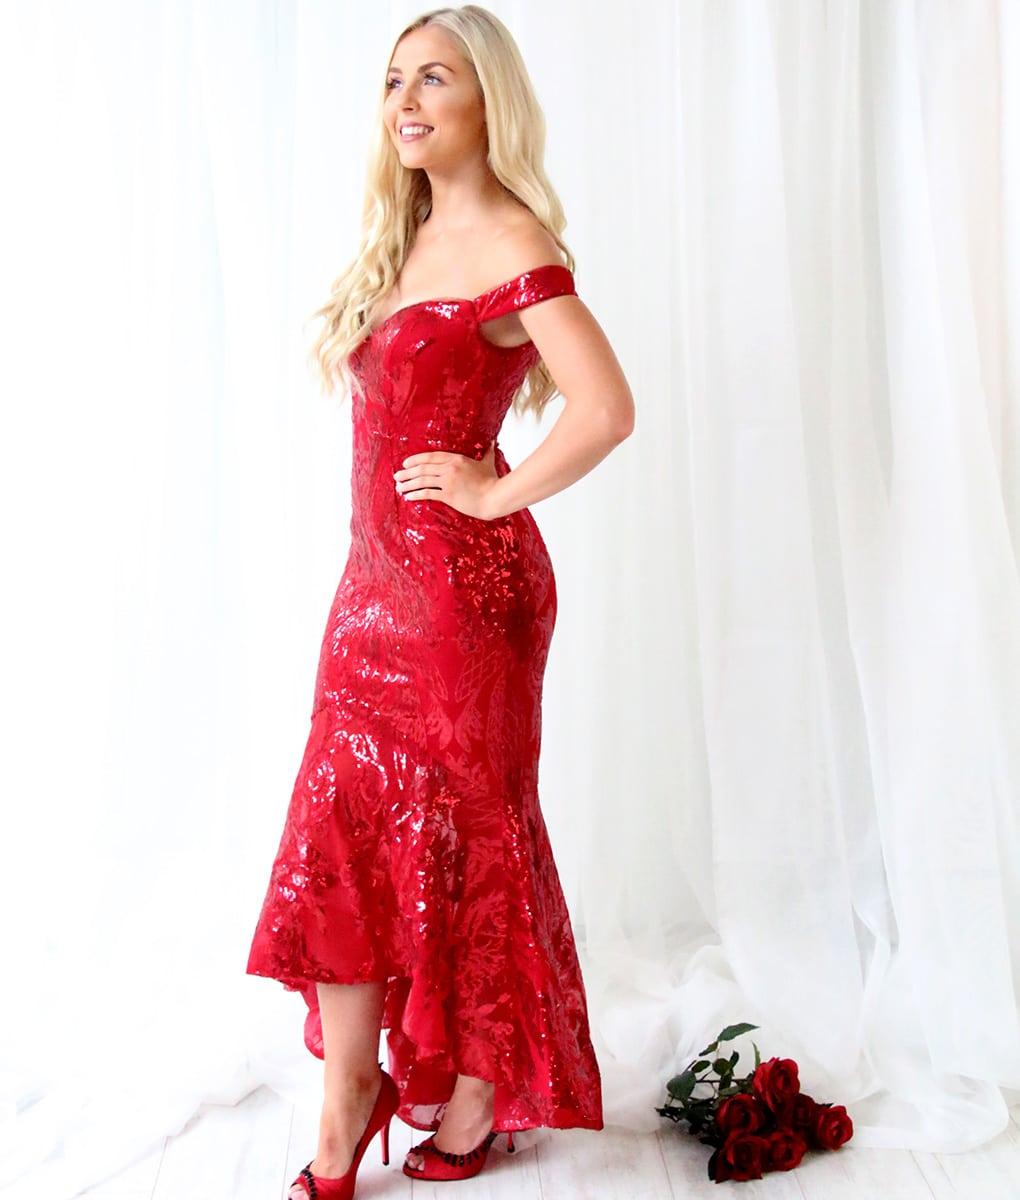 Alila-Burgundy-Sequin-Fishtail-Dress-Bariano